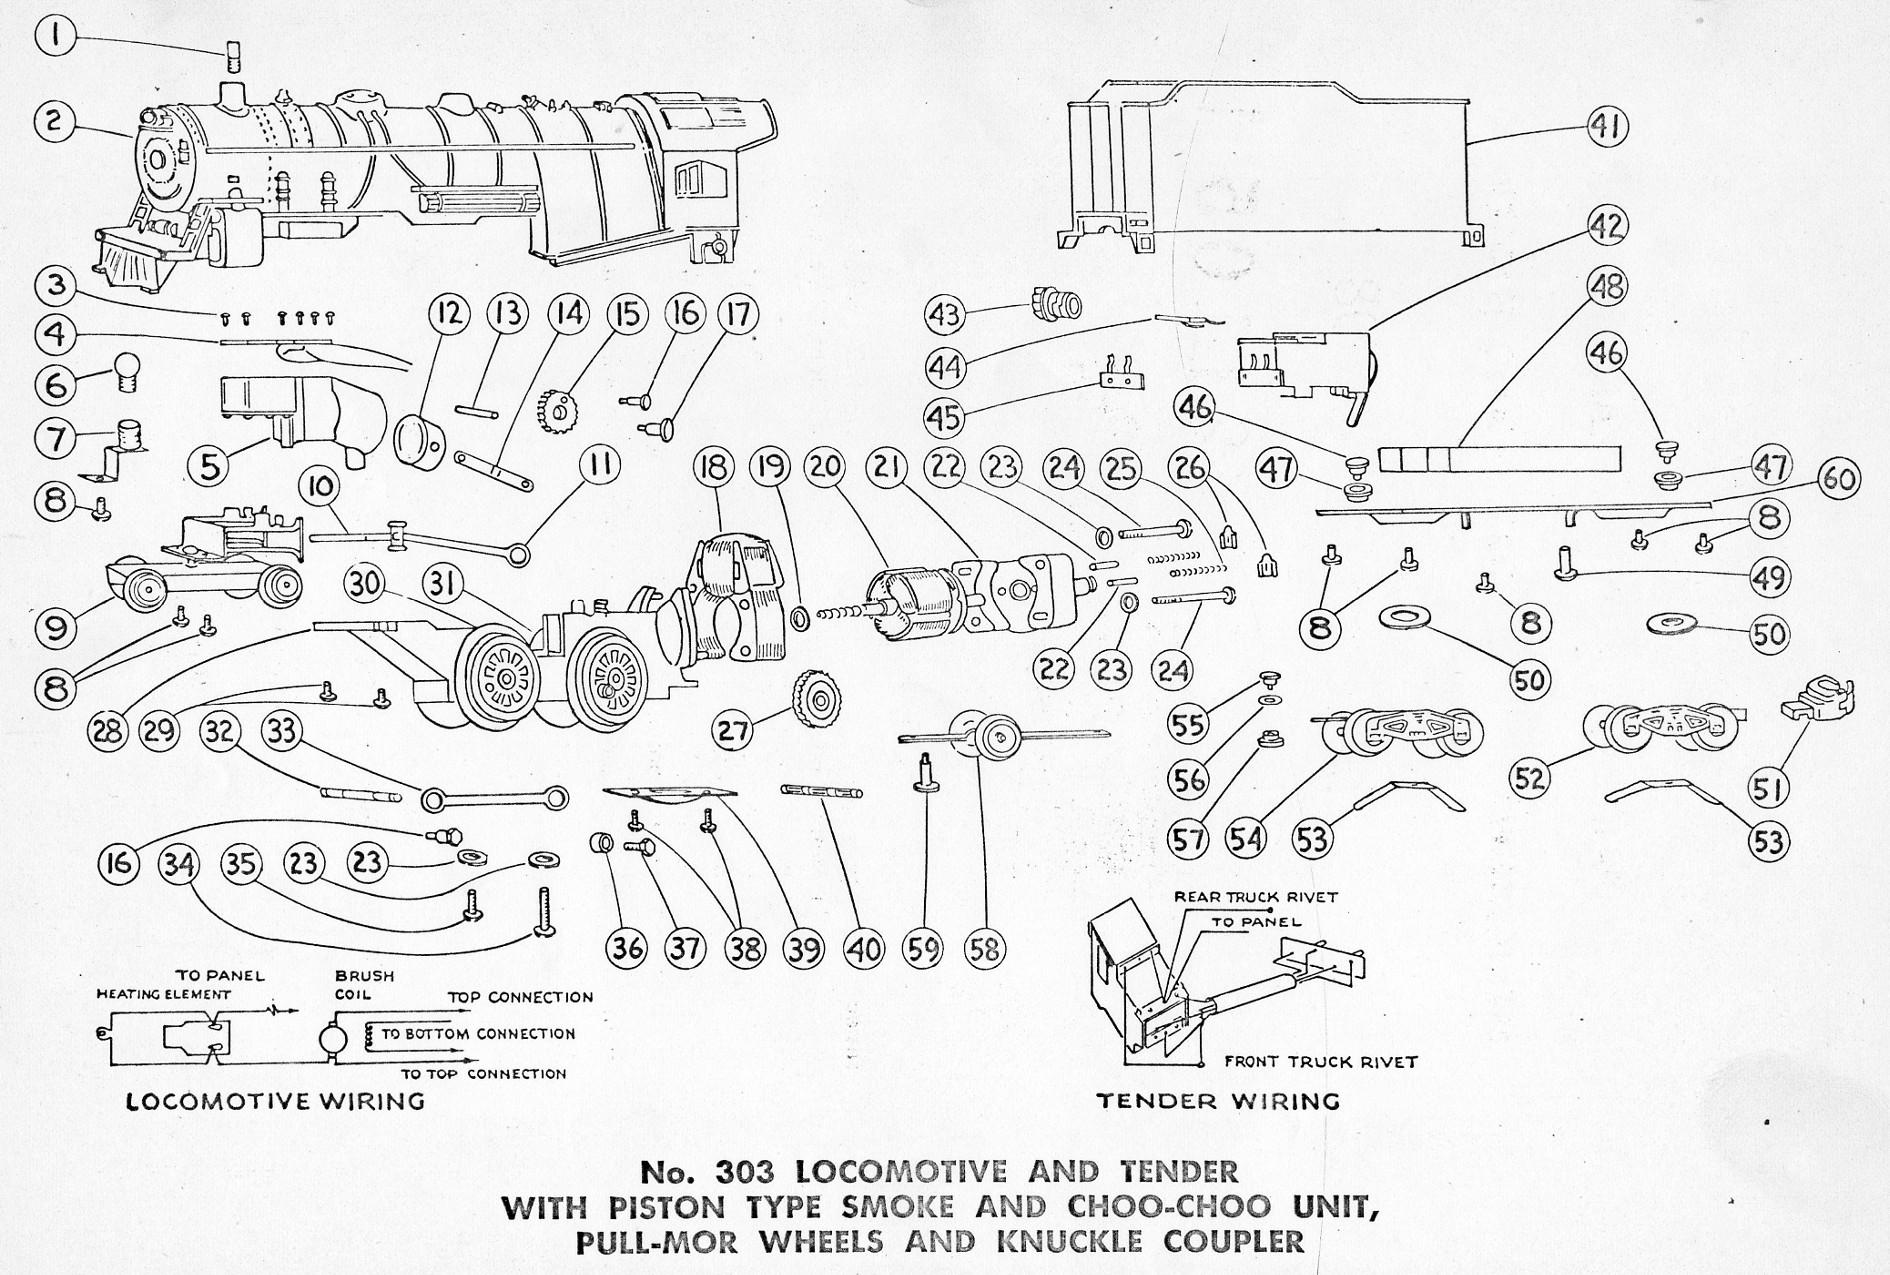 American Flyer Locomotive 303 Parts List And Diagram